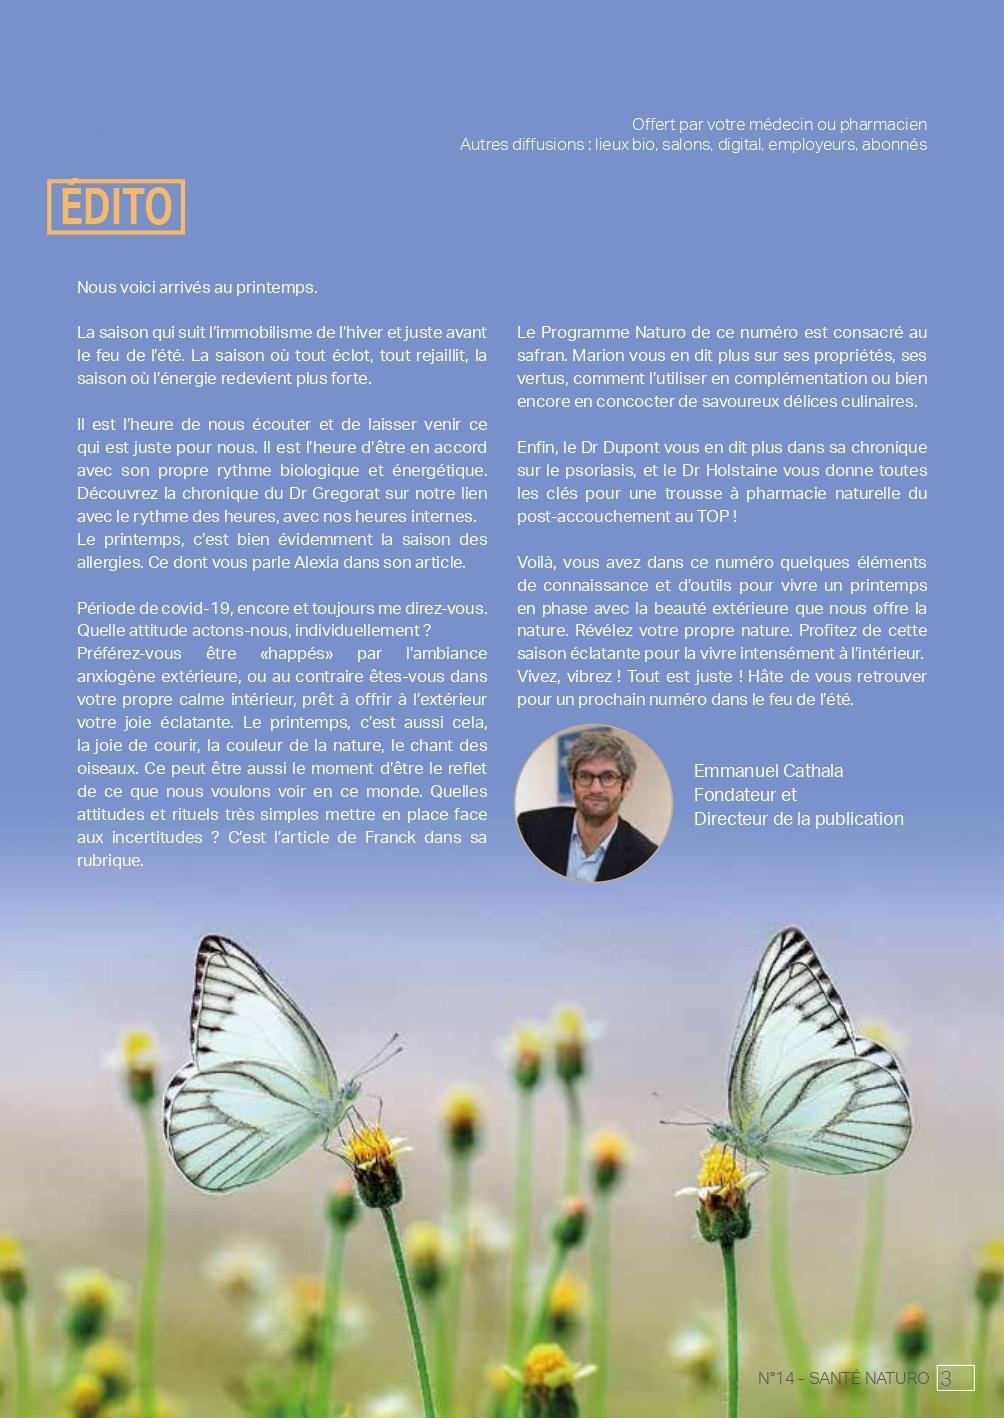 sante-naturo-14-naturopathie-sante-naturelle-integrative-holistique-et-medecines-douces-edito